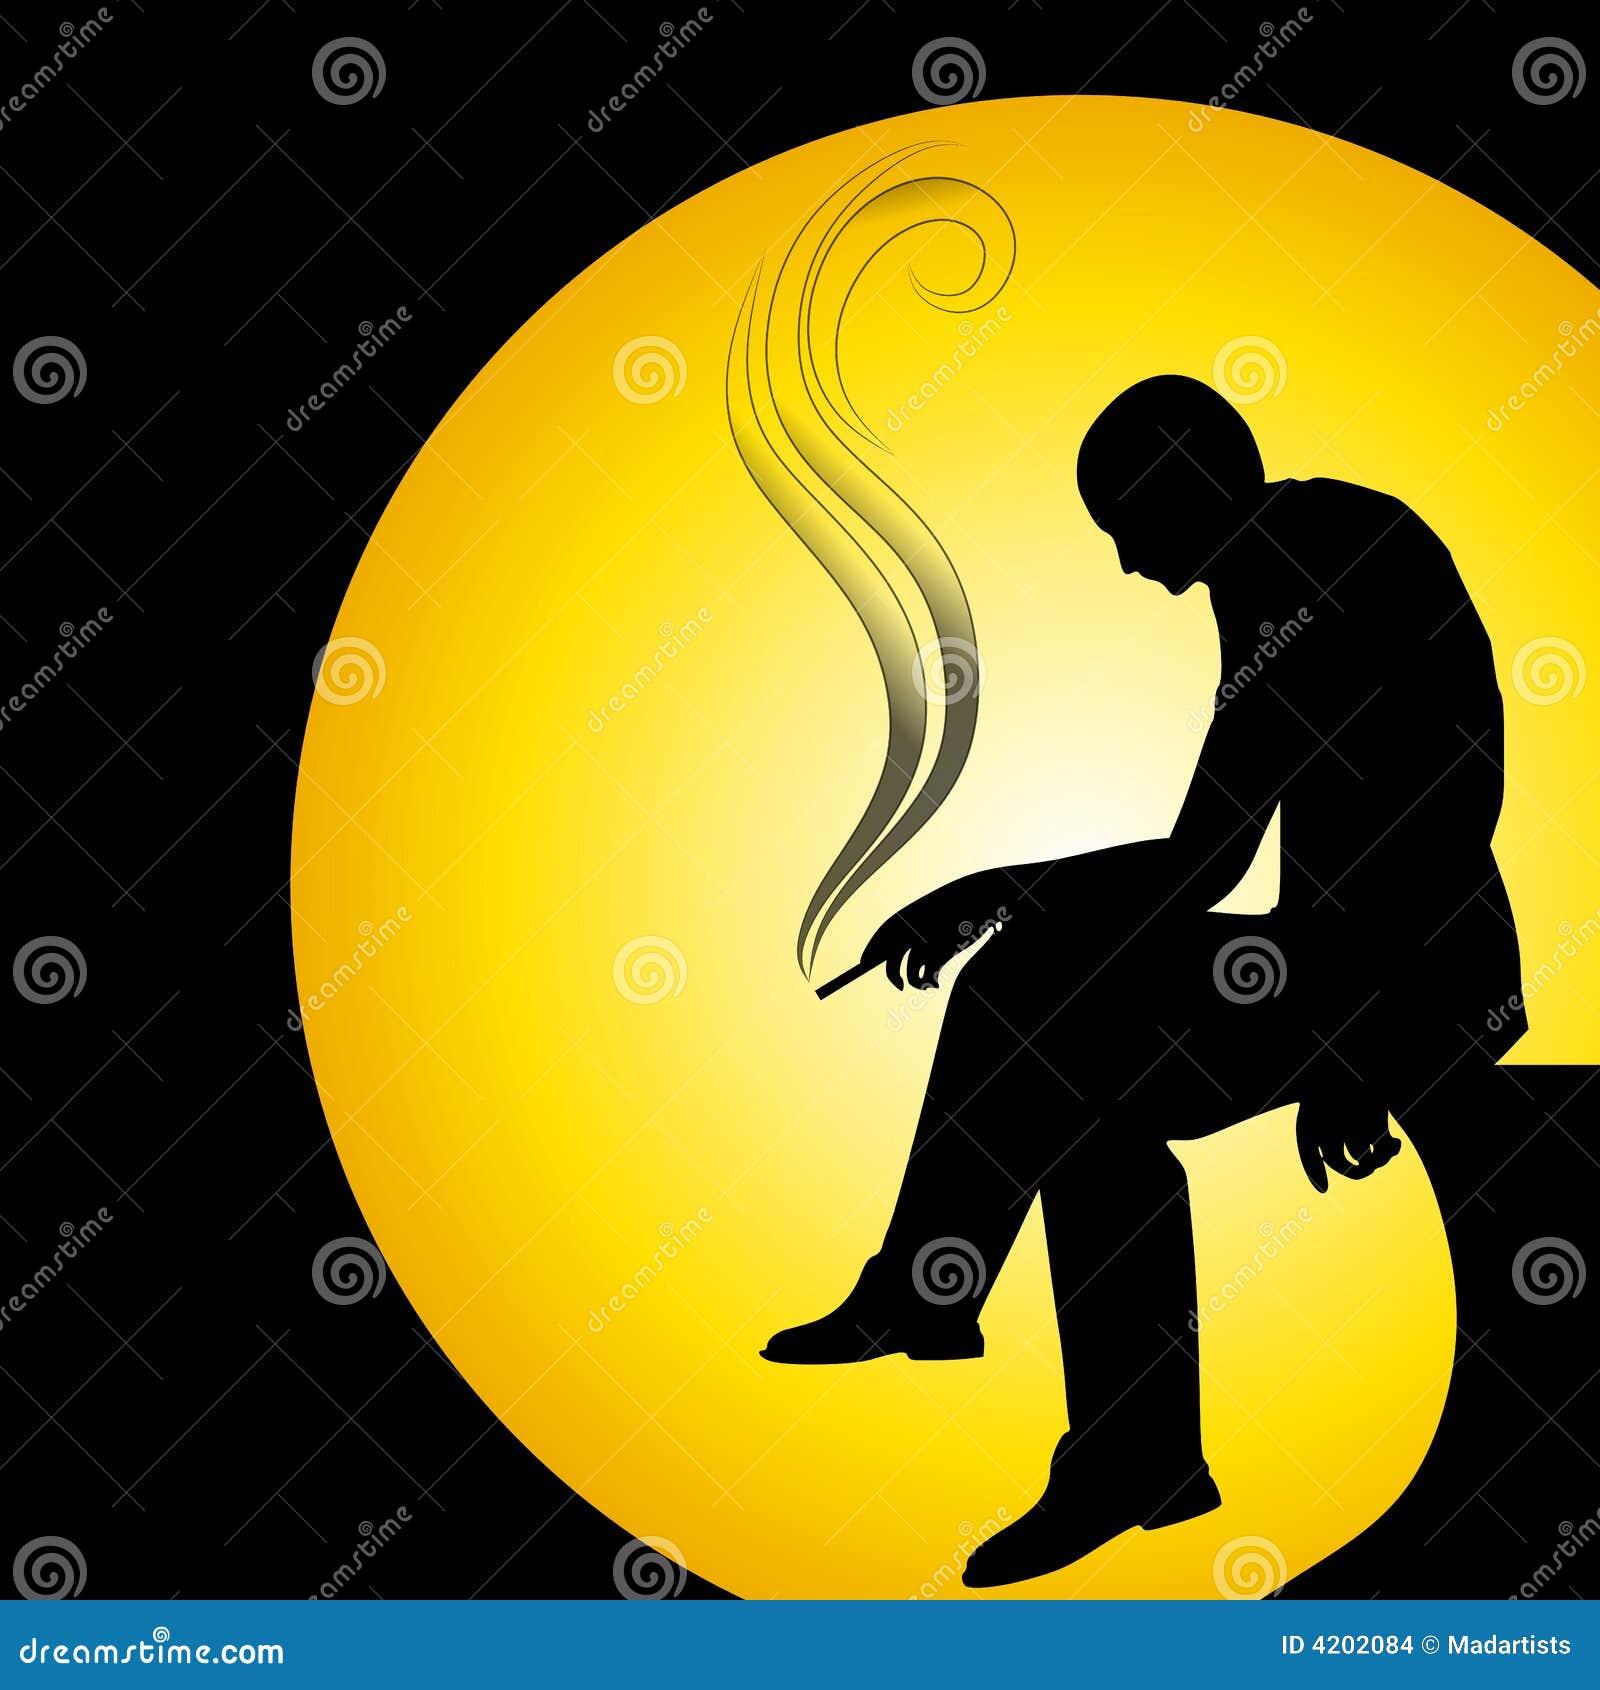 Man Silhouette Smoking Alone Stock Images - Image: 4202084